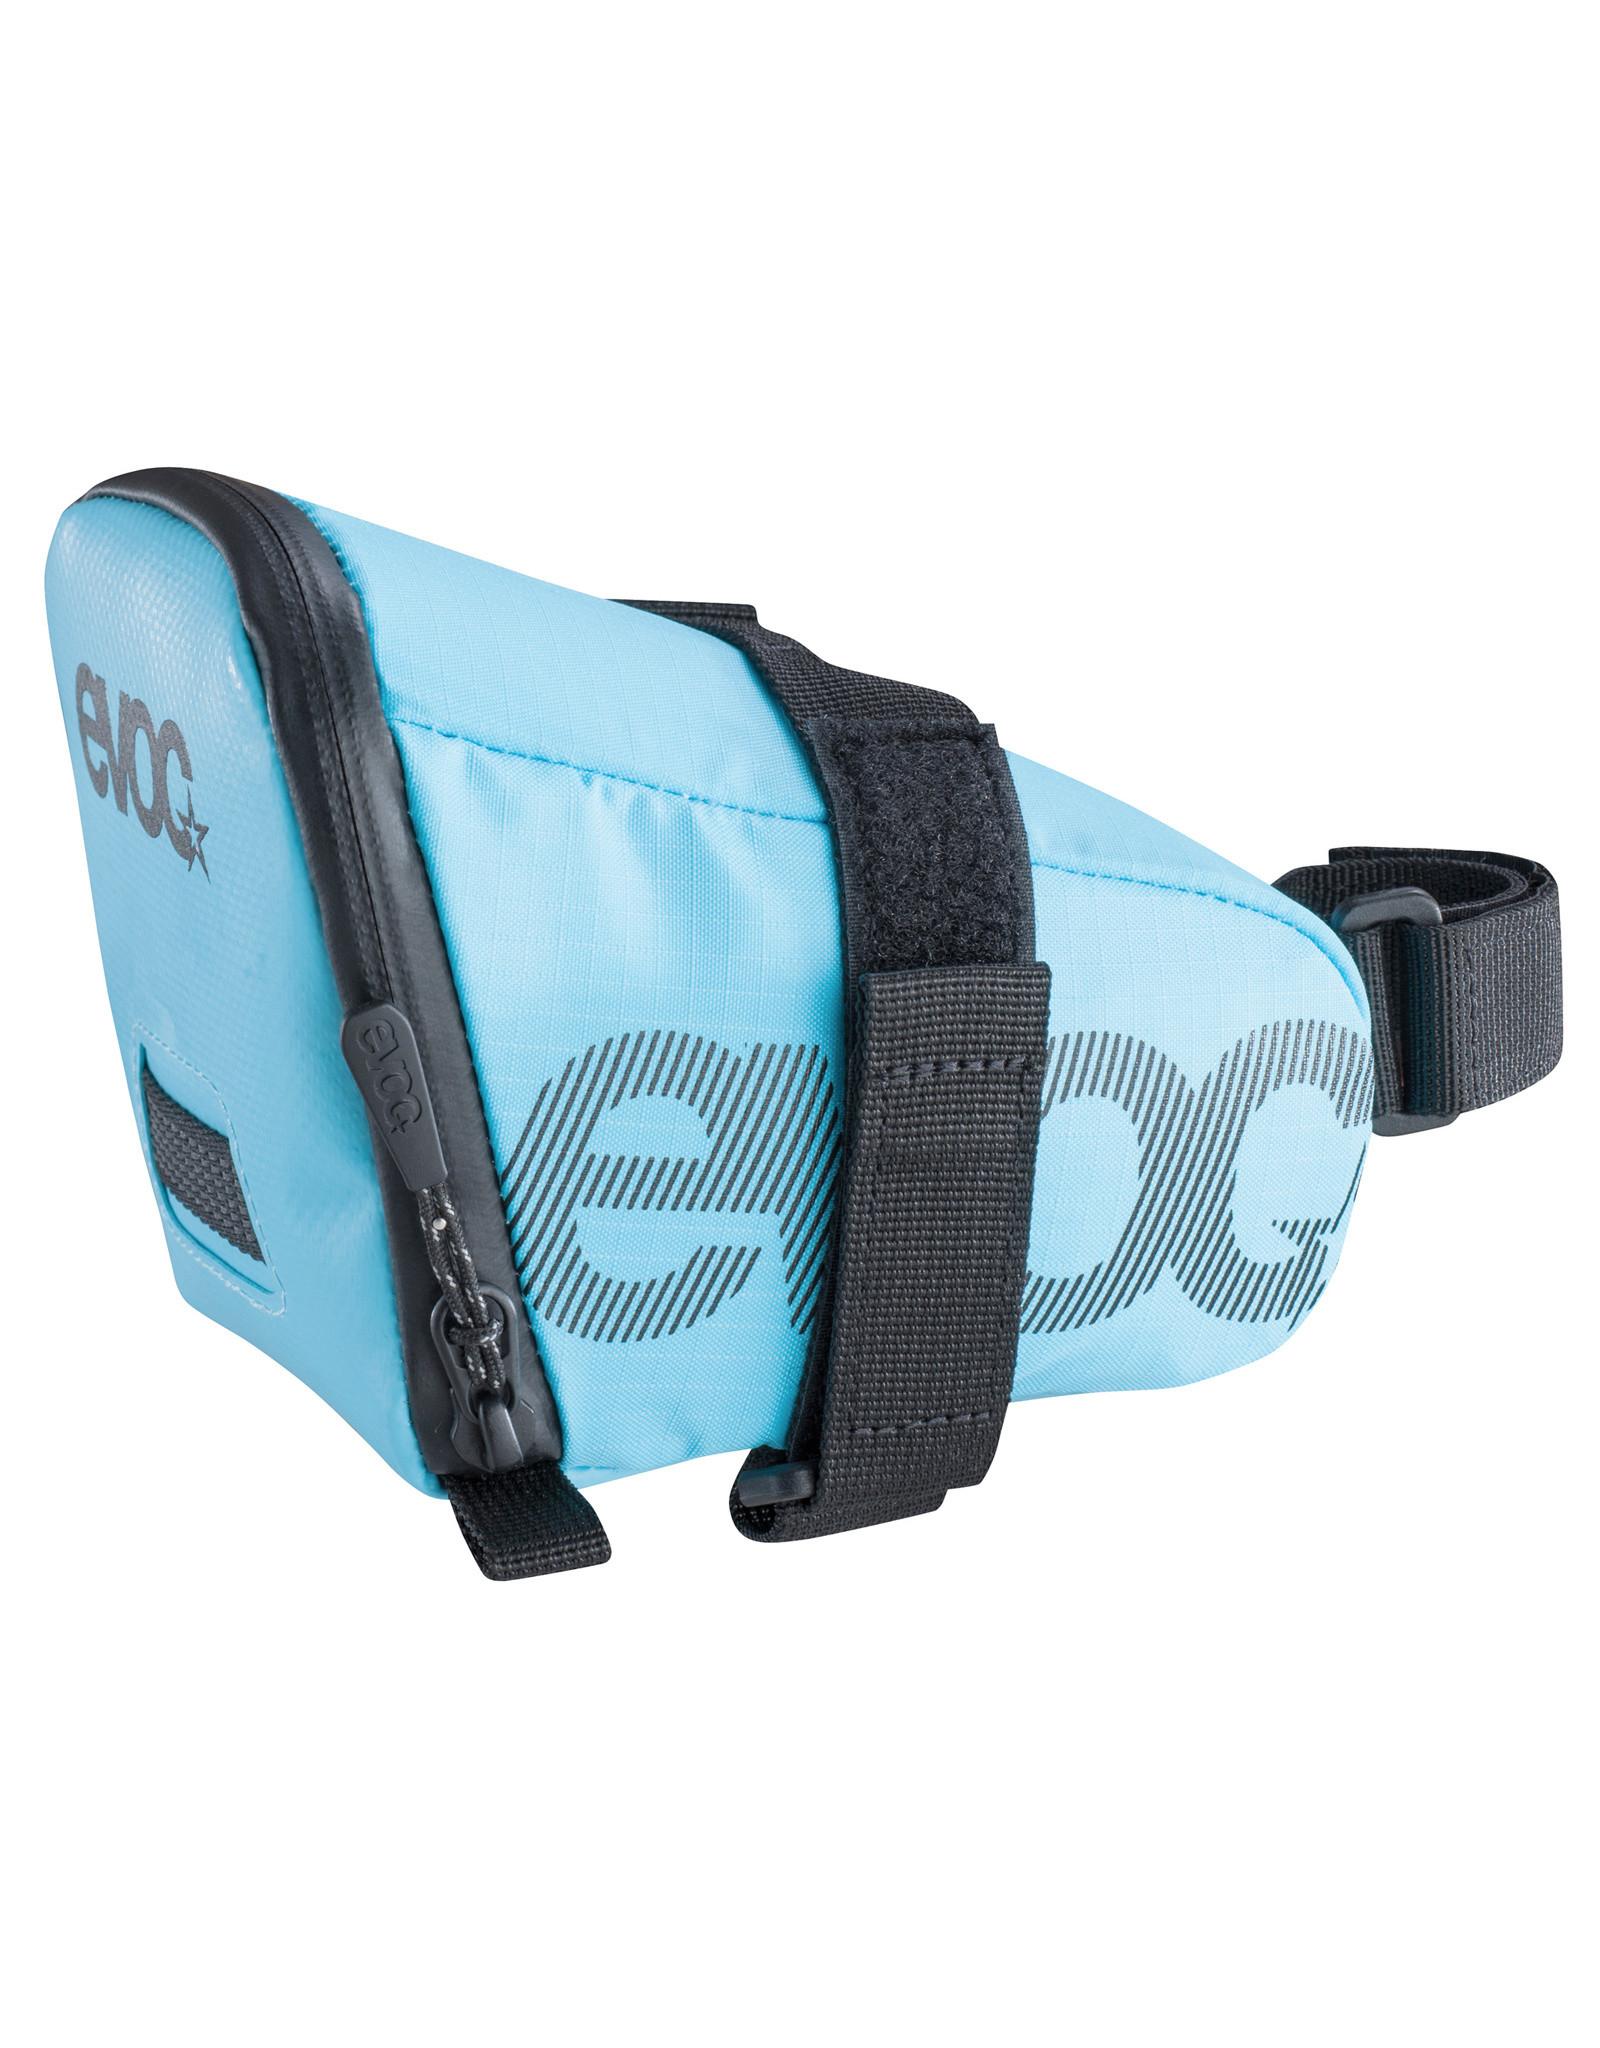 EVOC EVOC, Tour, Sac de selle, L, Bleu Néon